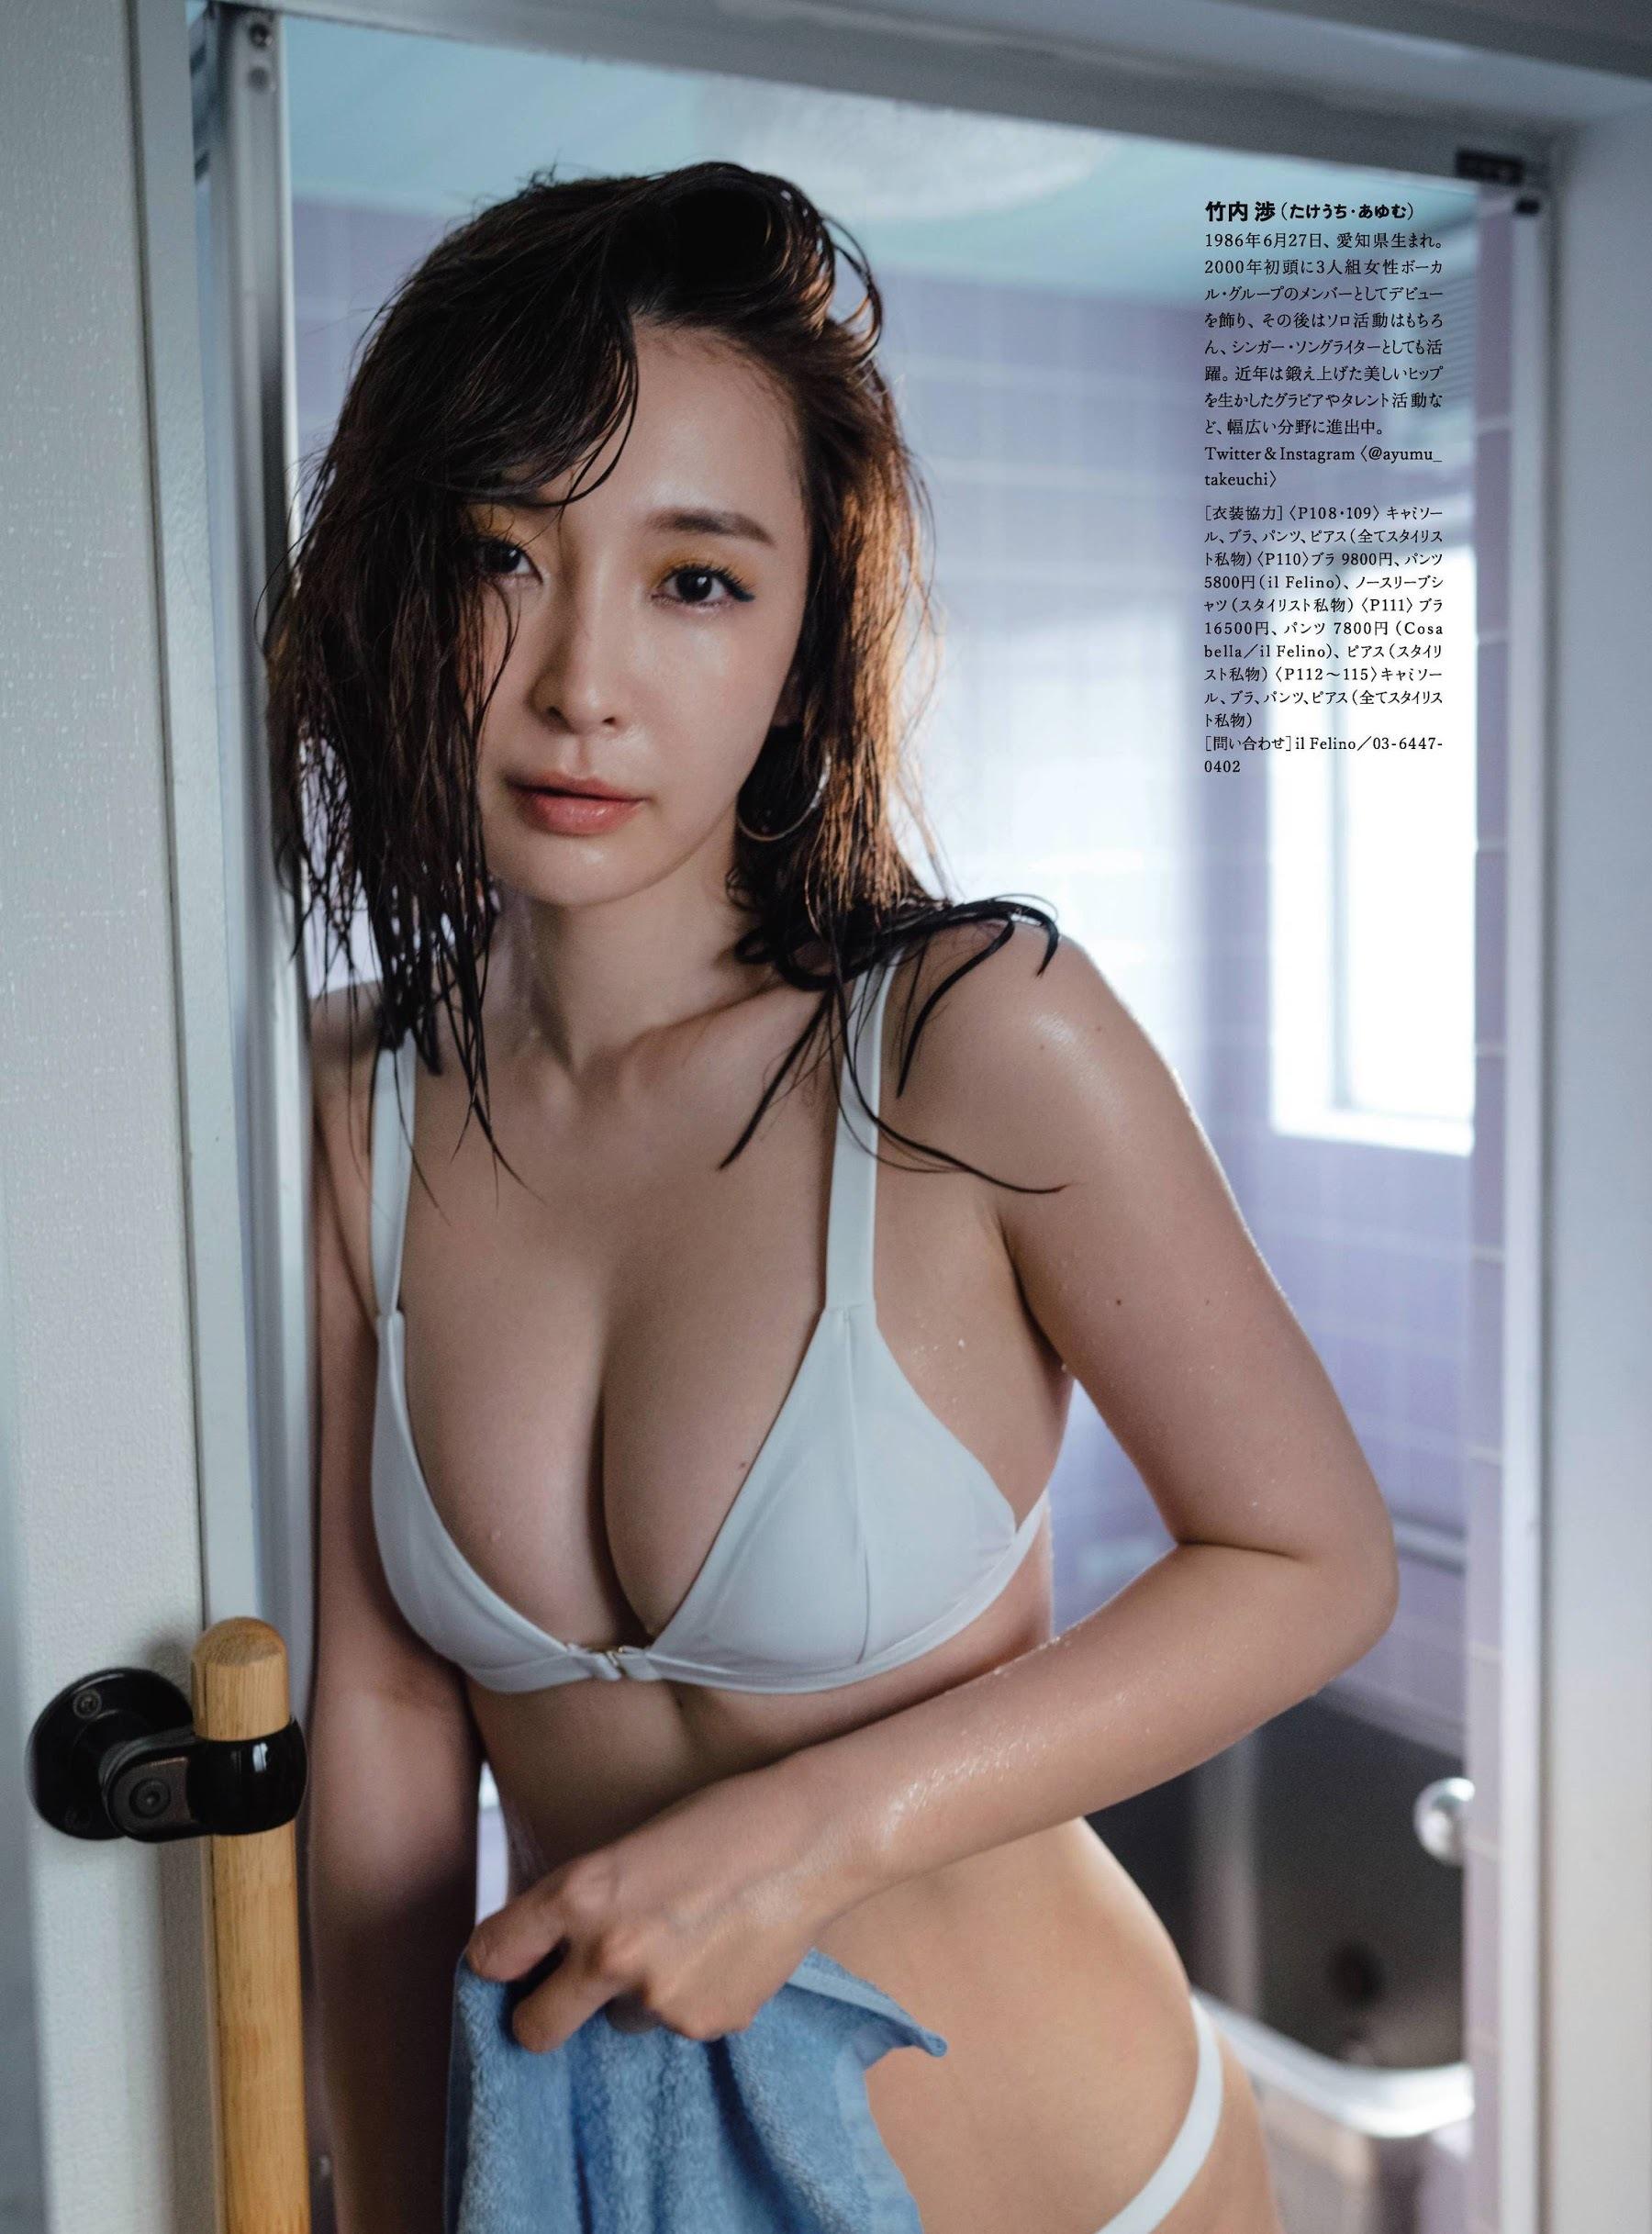 Ultimate beautiful ass Wataru Takeuchi gravure swimsuit picture006